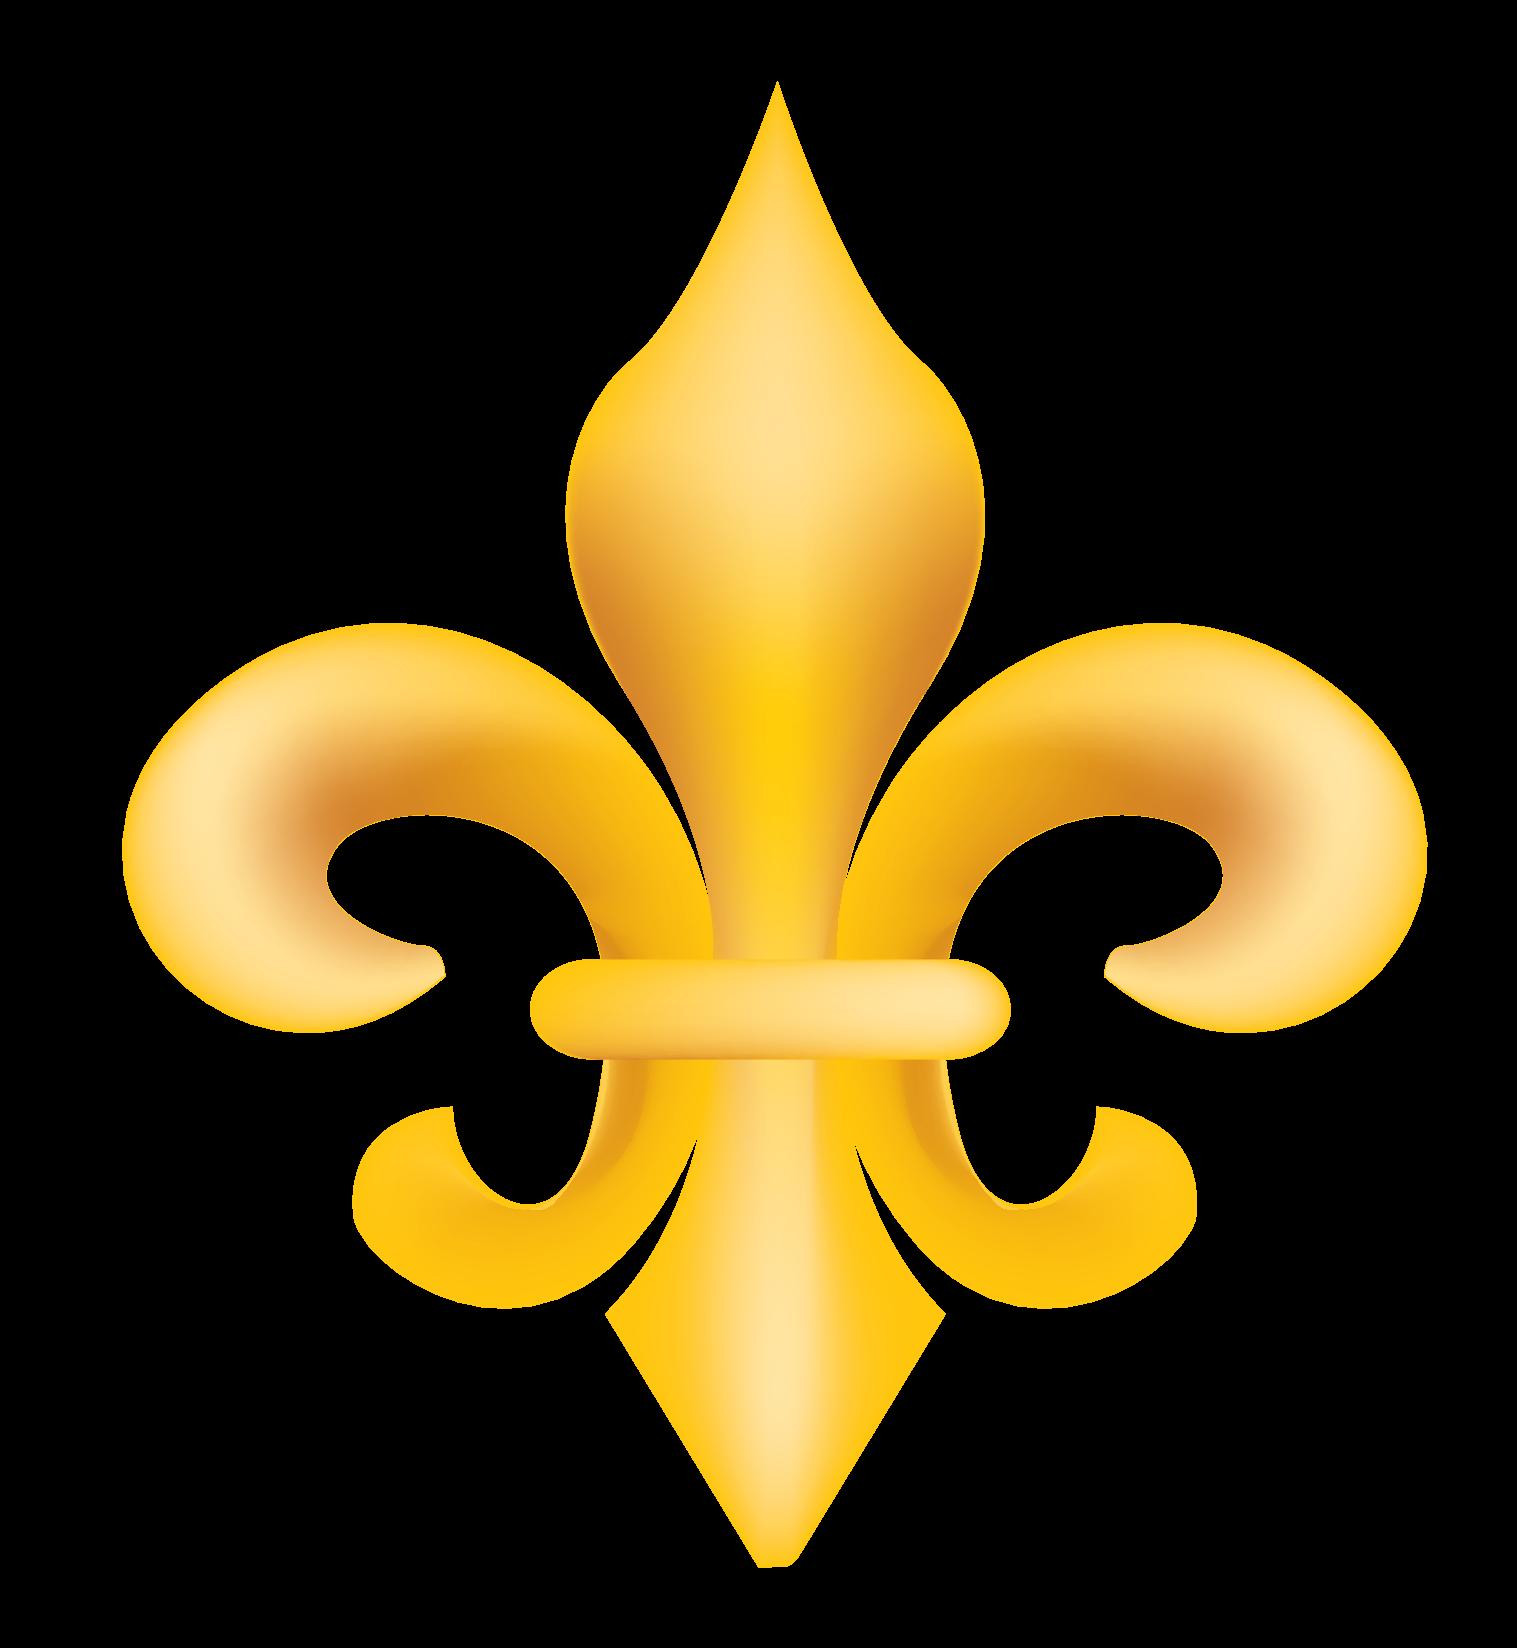 Gold Fleur de Lis Vector Clip Art